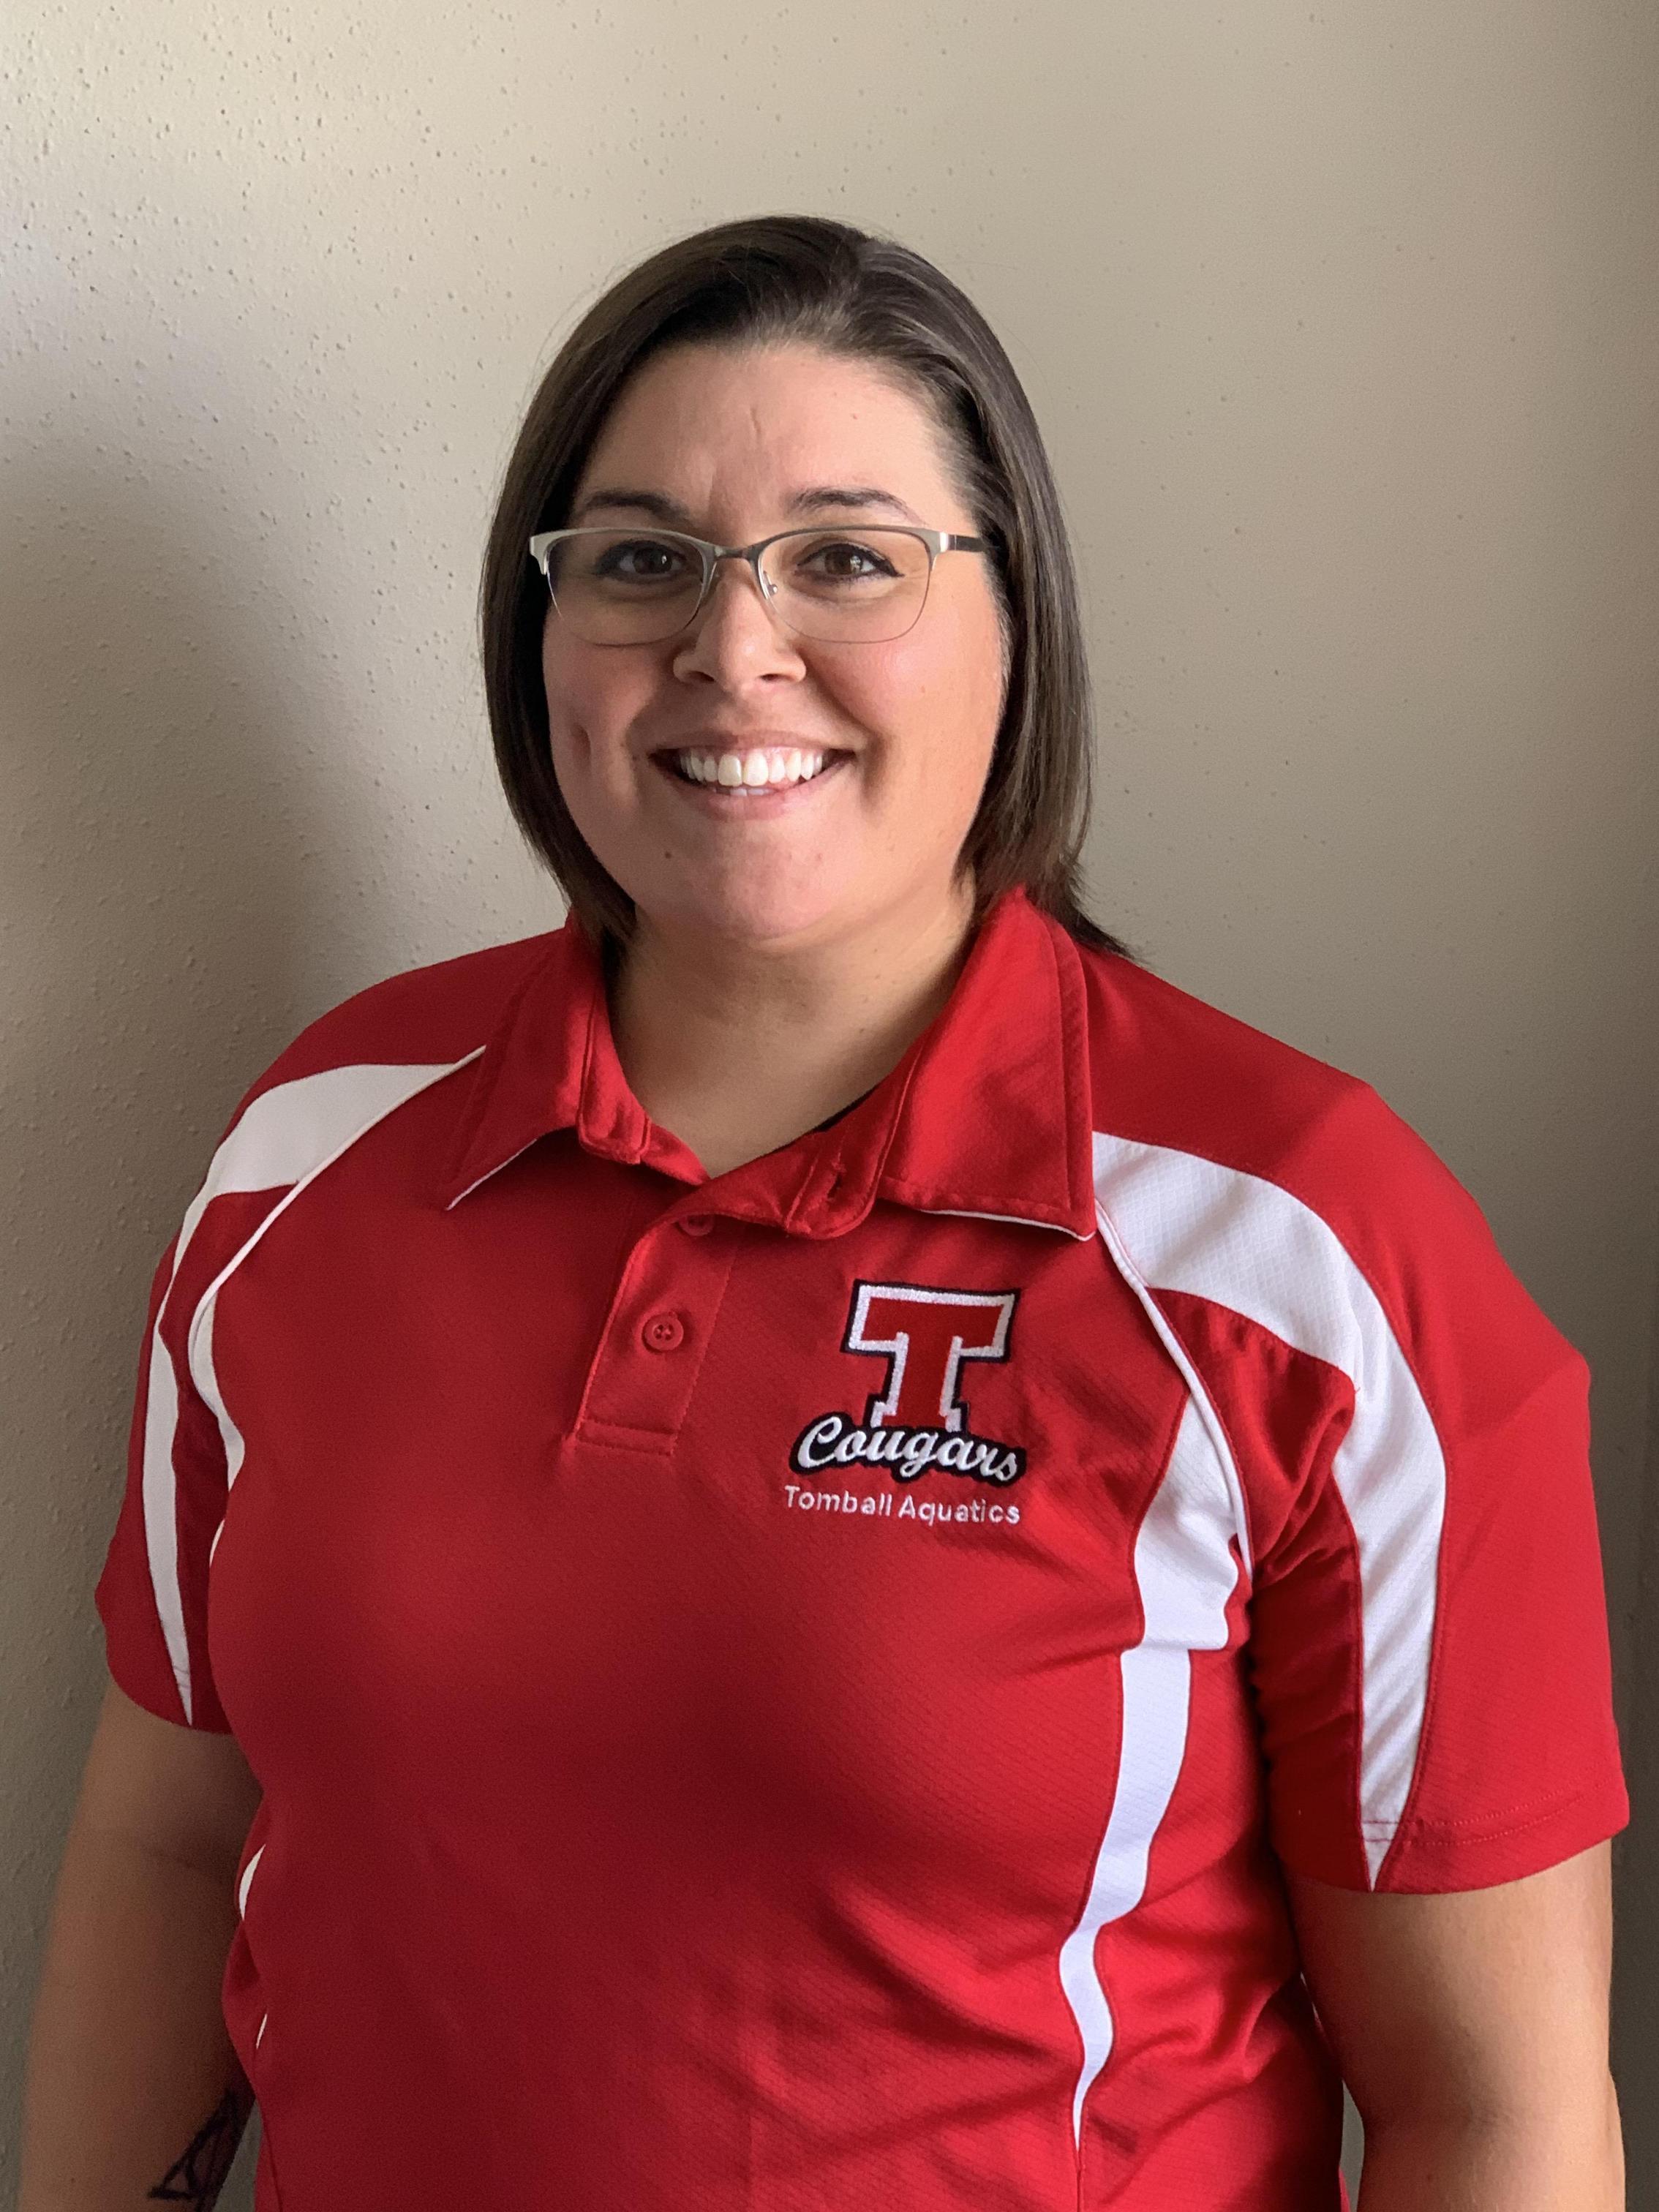 Coach Shaunna Purtell